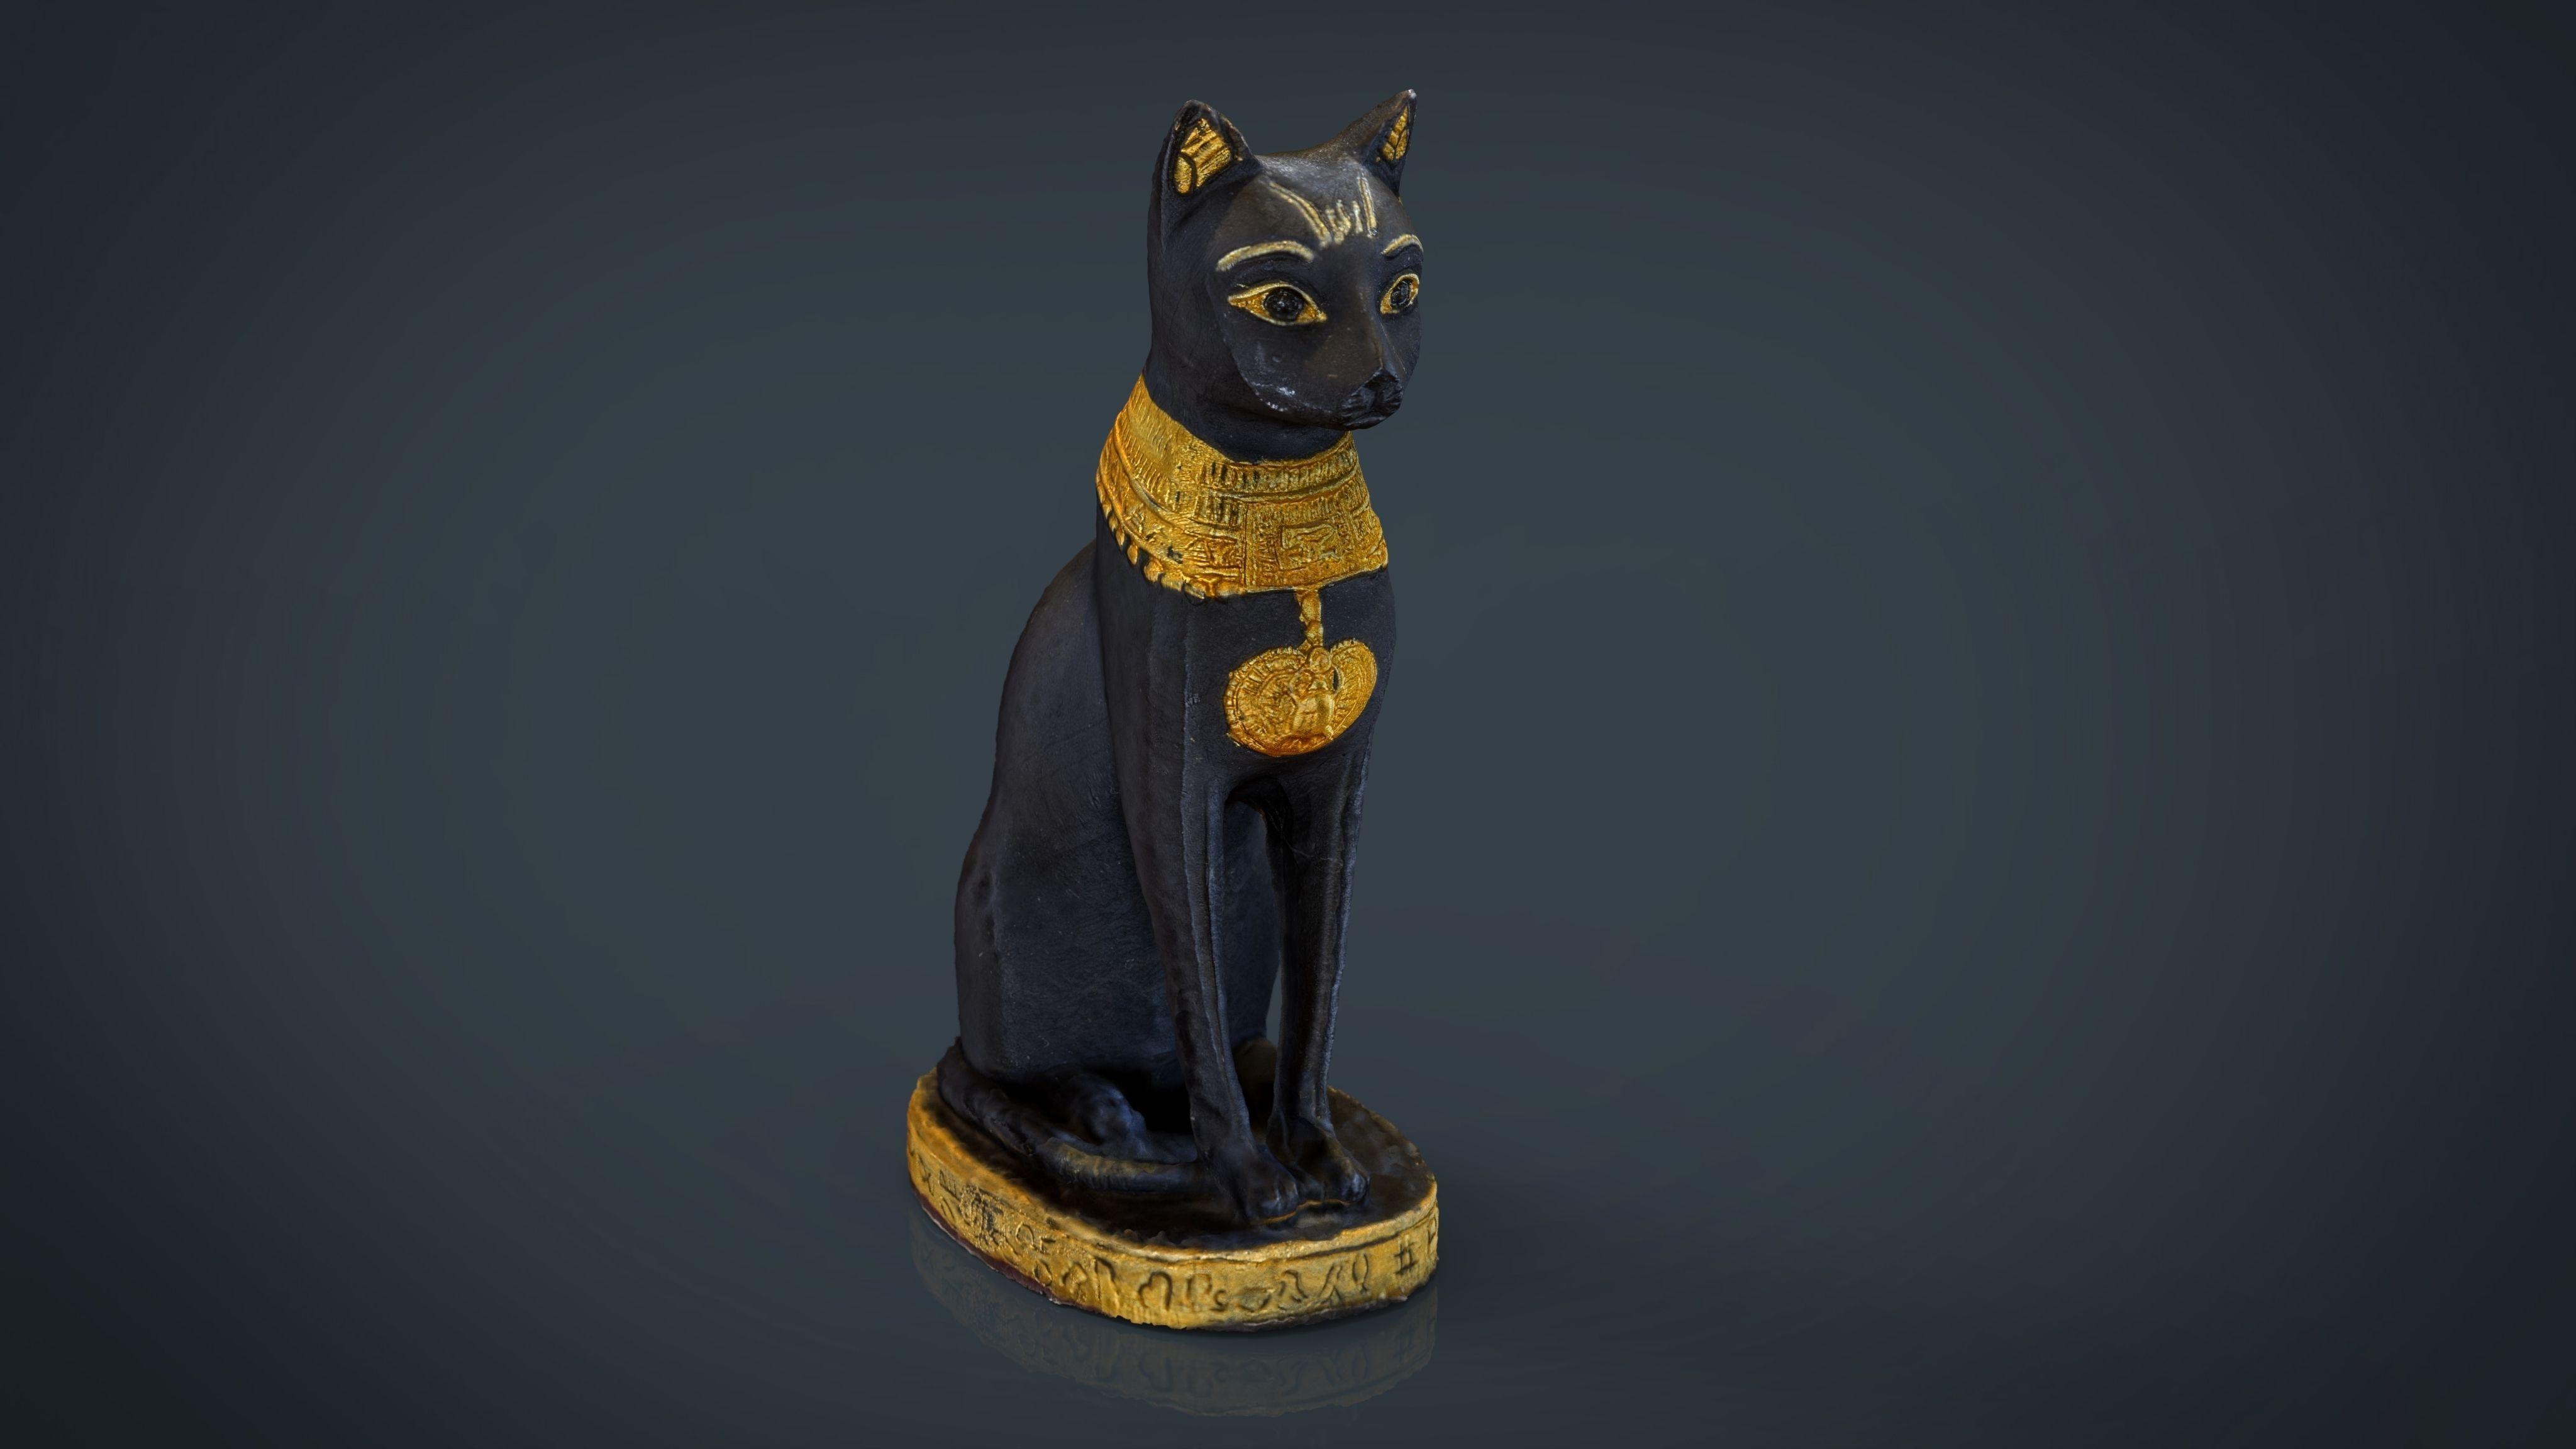 Egyptian Cat 3D Model 3D printable | CGTrader.com